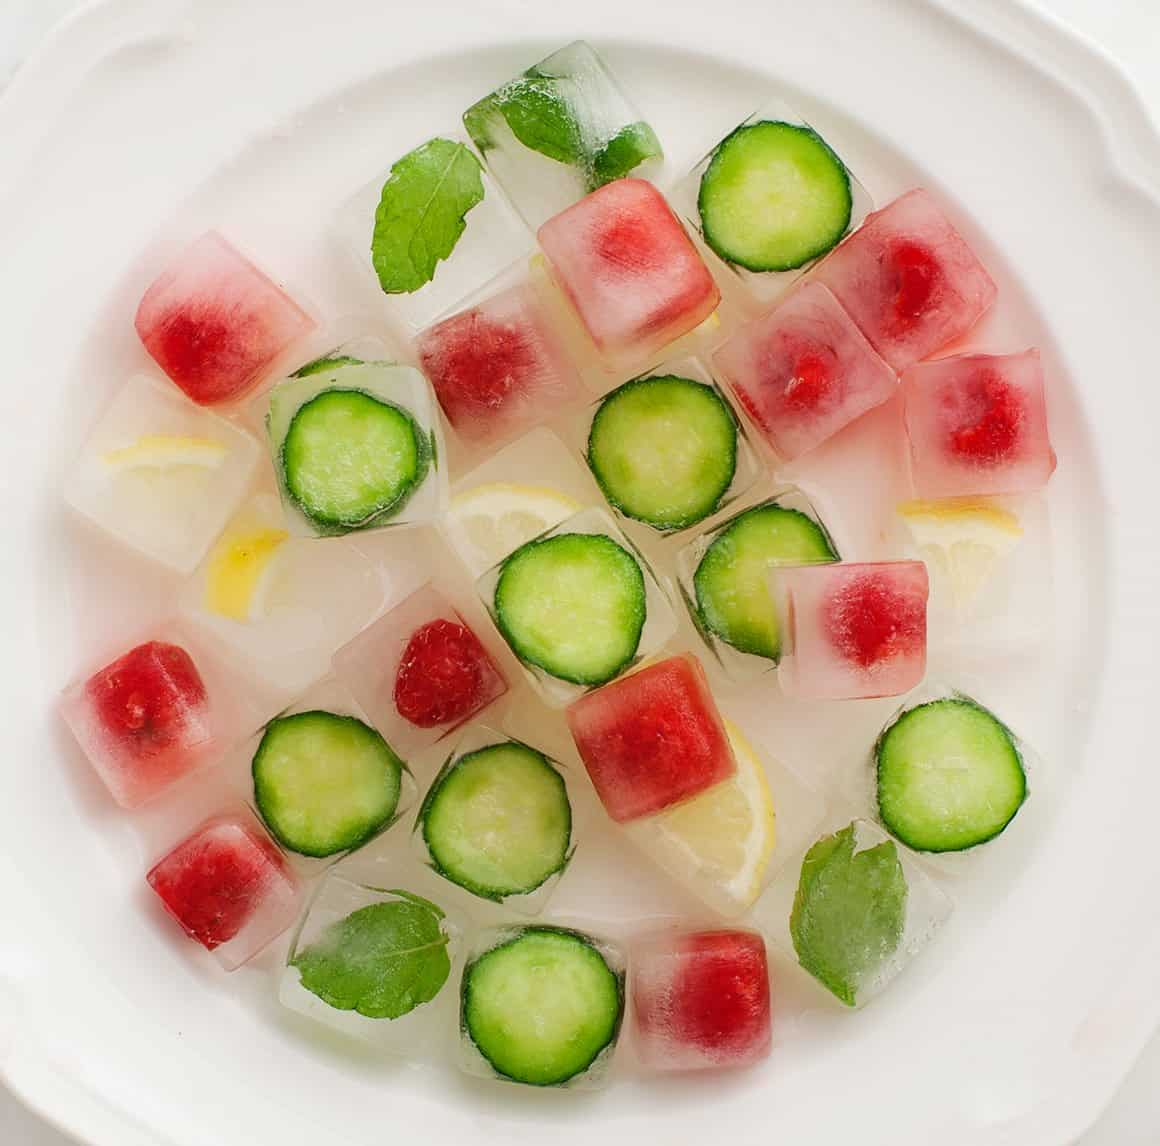 Iced Tea with Fancy Herbal & Fruity Ice